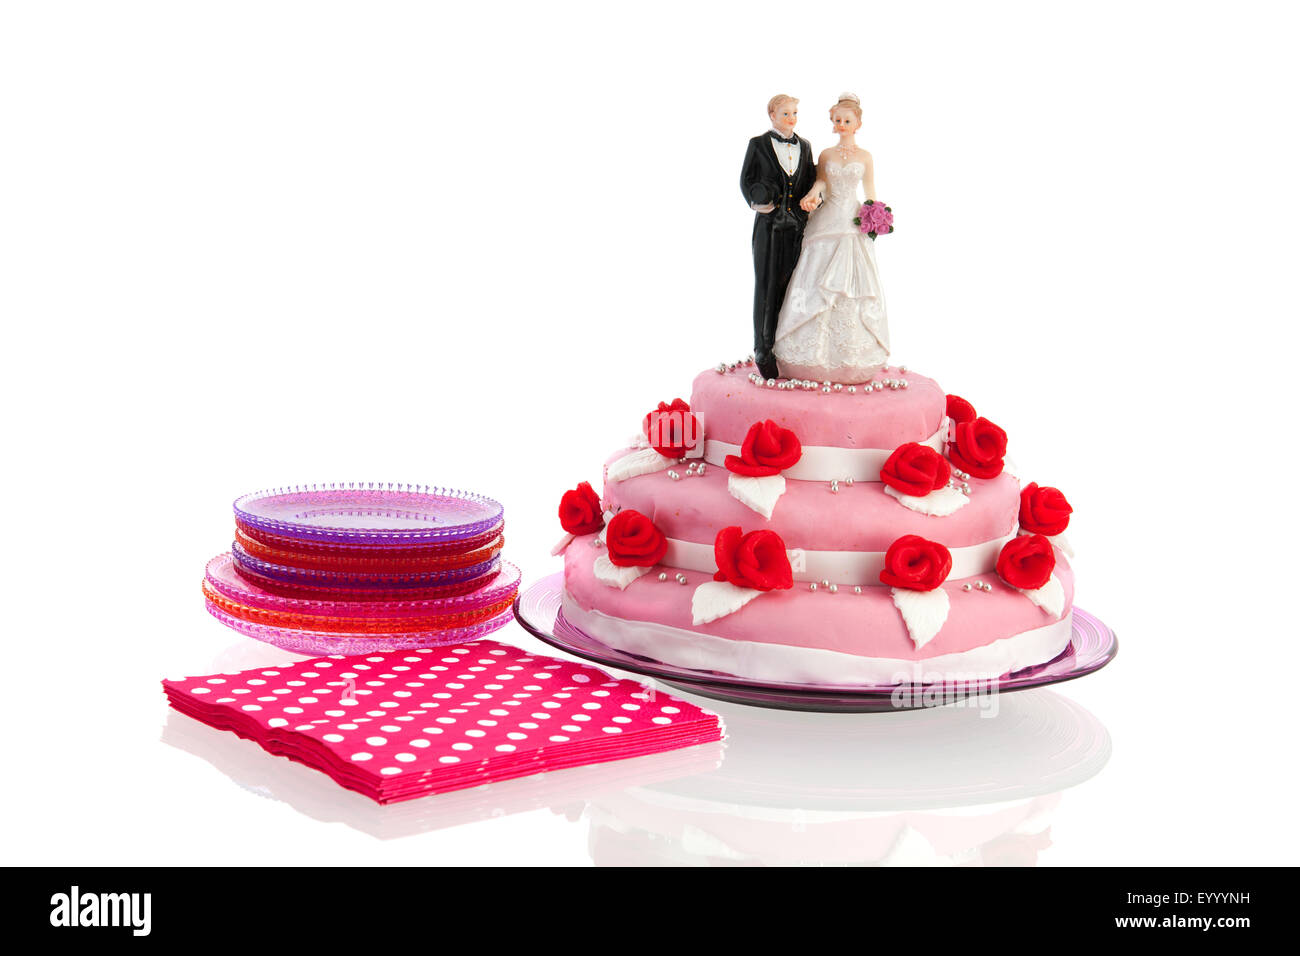 Wedding Cake Topper Wedding Cake Figures Stock Photos & Wedding Cake ...